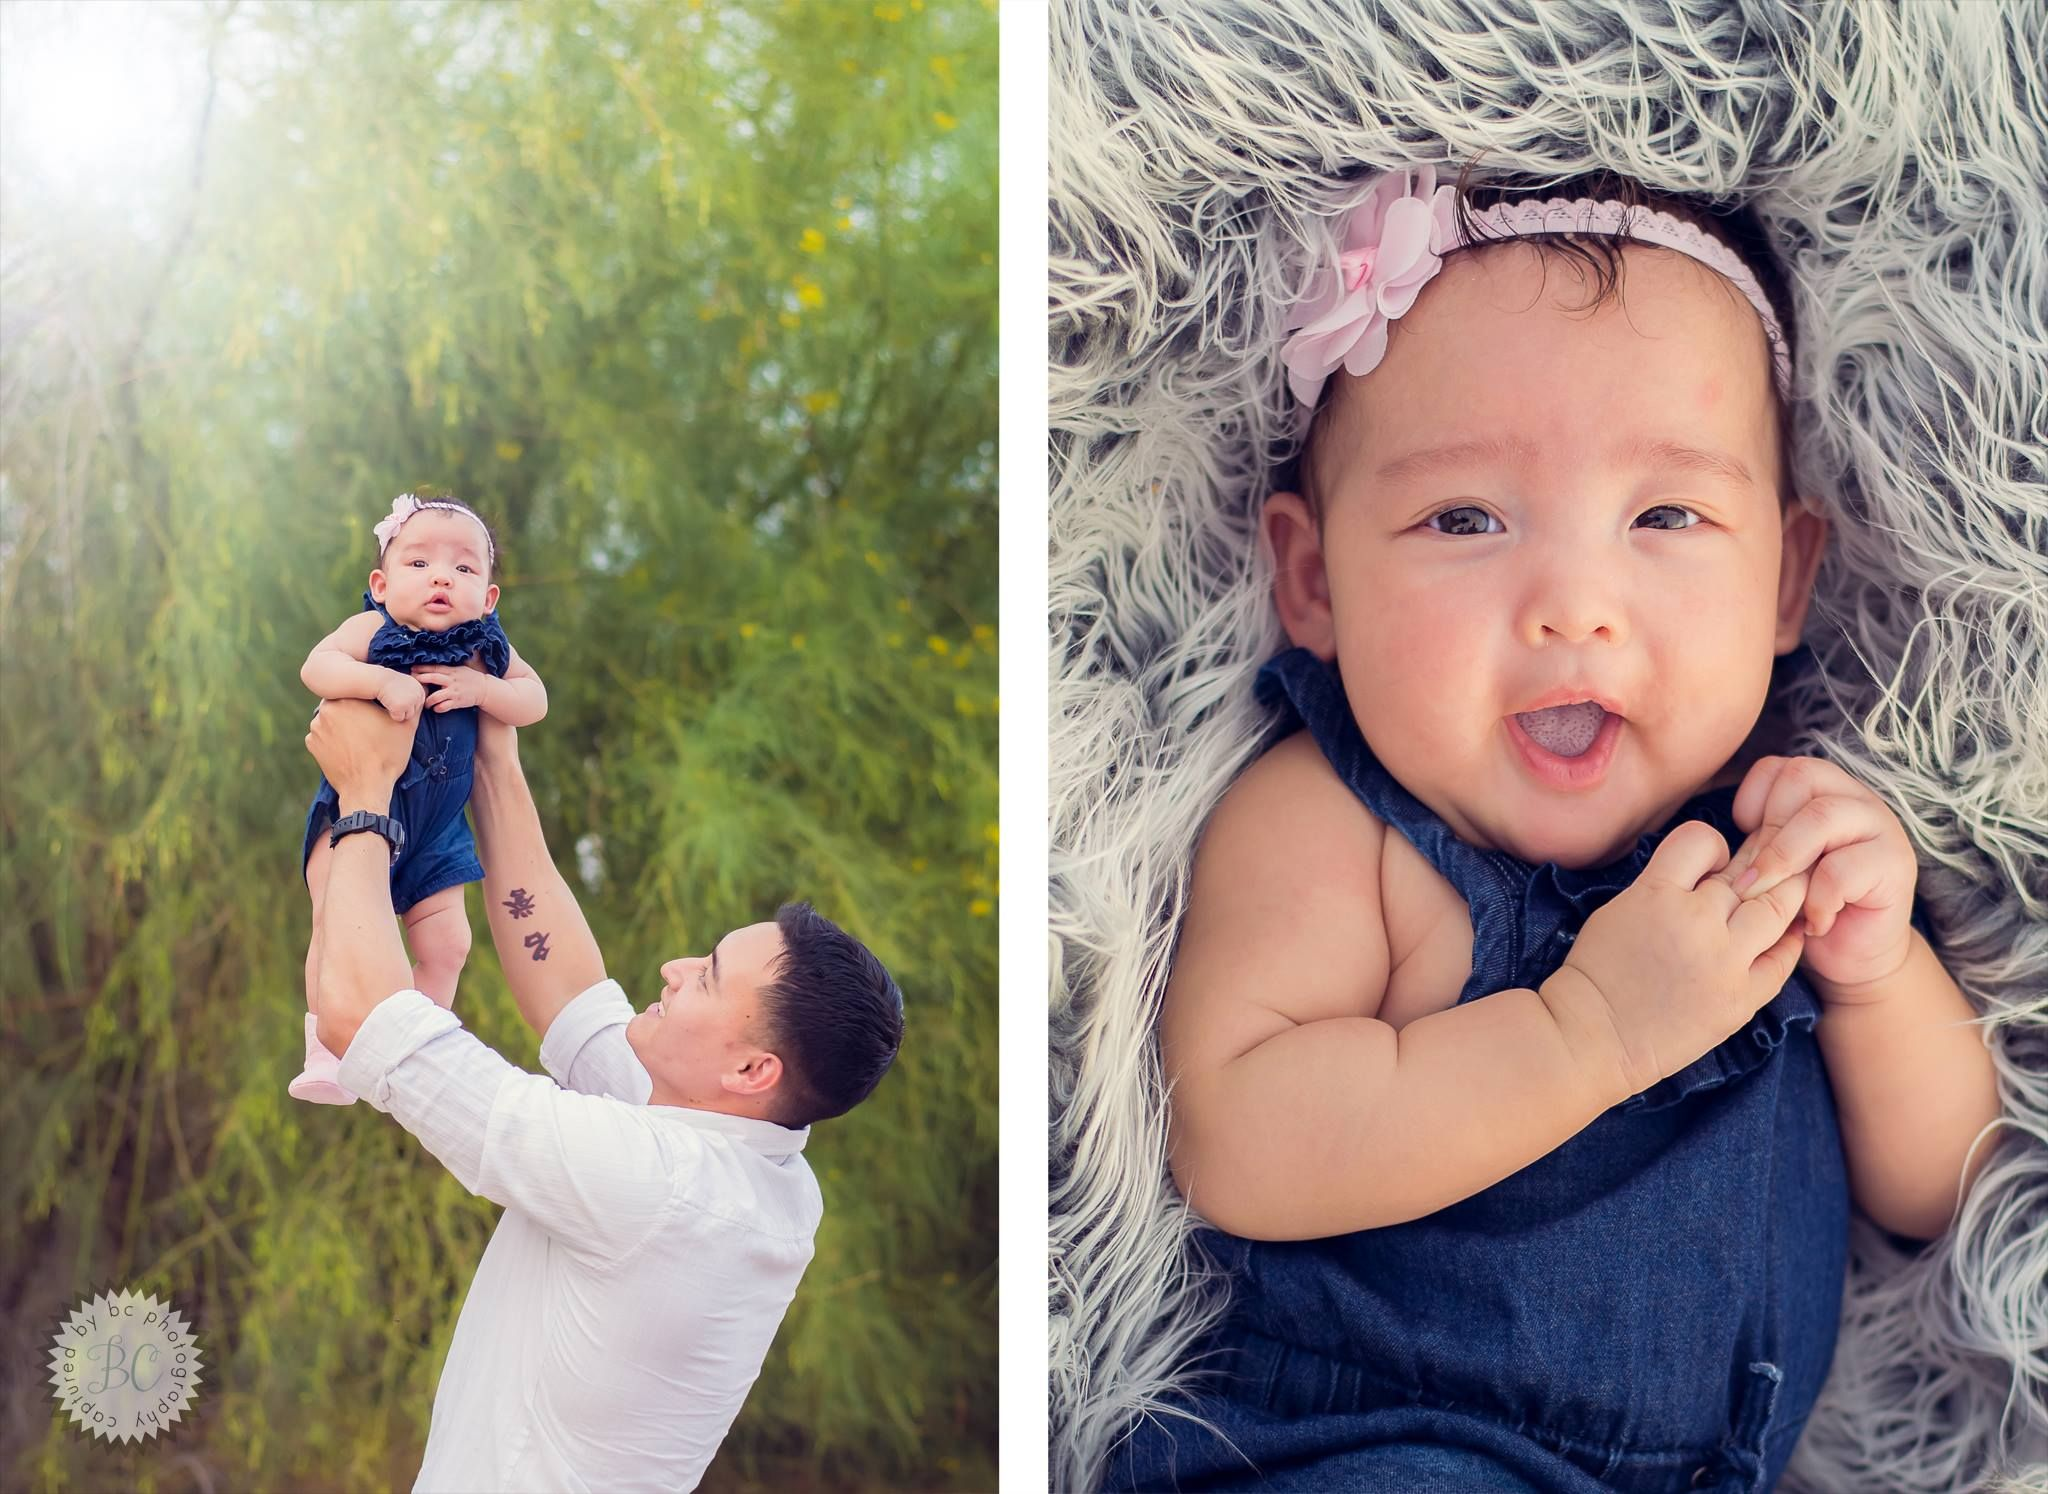 Unique baby boy photo ideas 3 monthly photoshoot